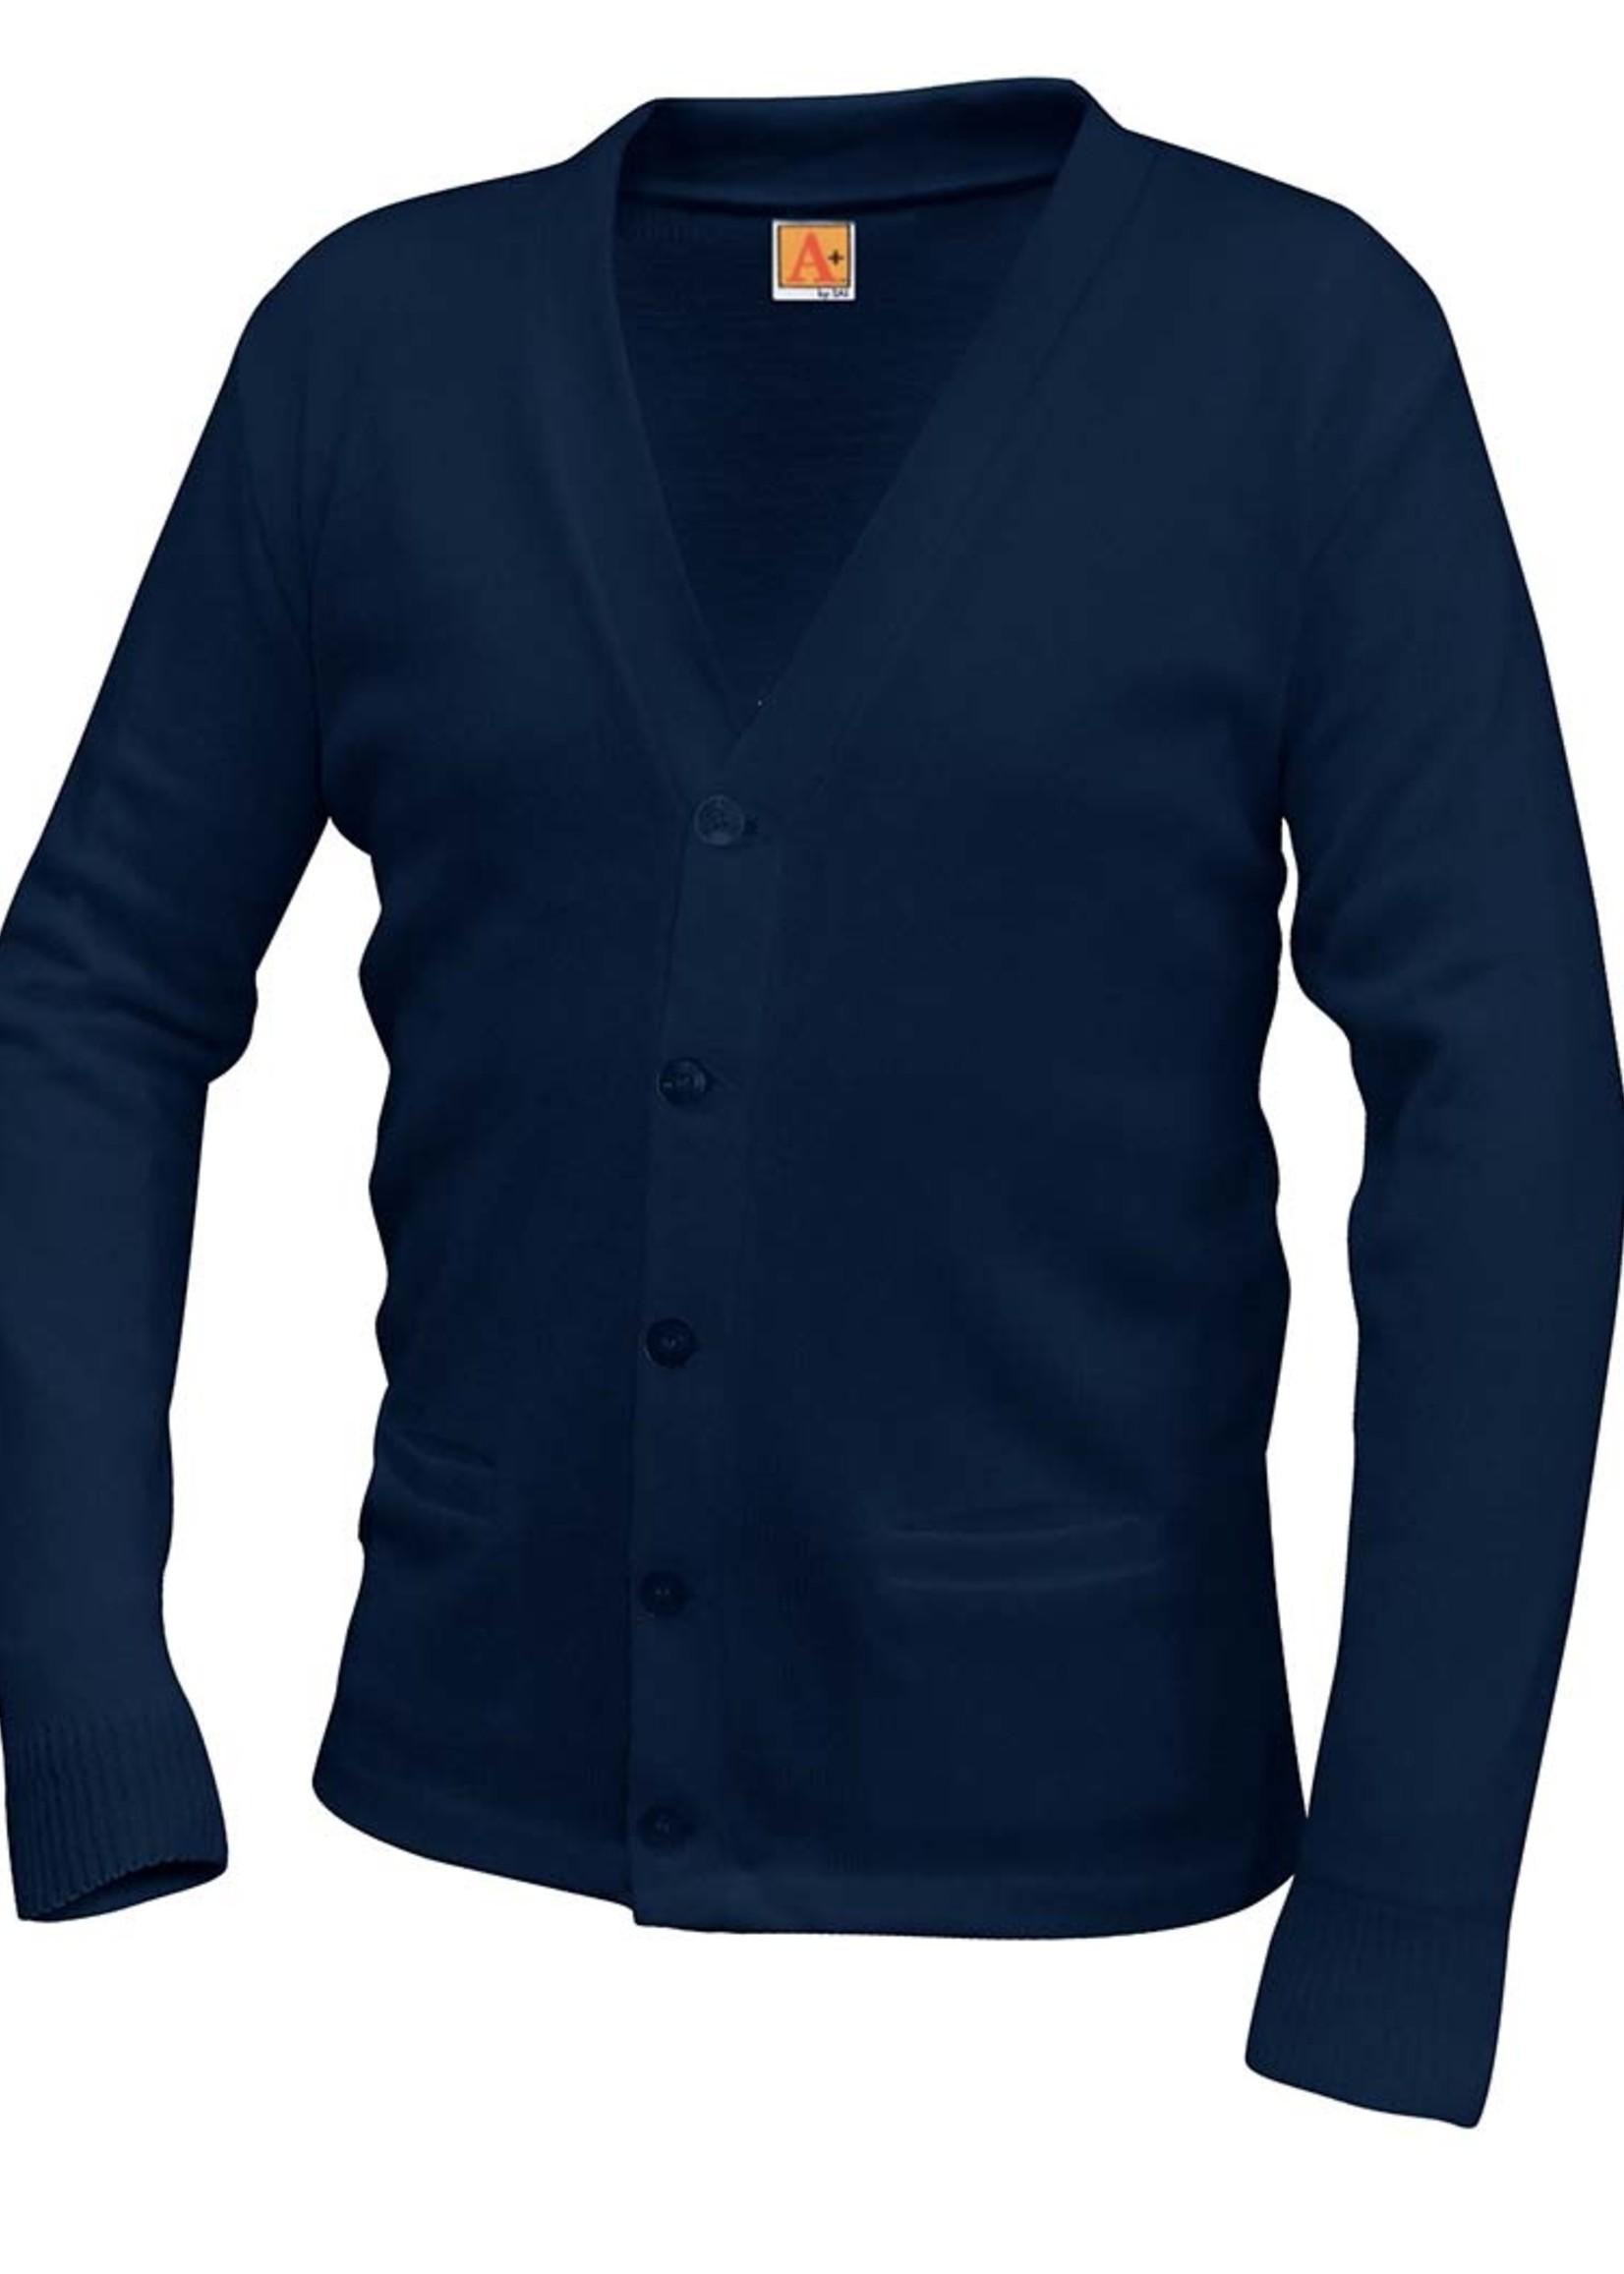 SPX Navy V-neck cardigan sweater with pockets